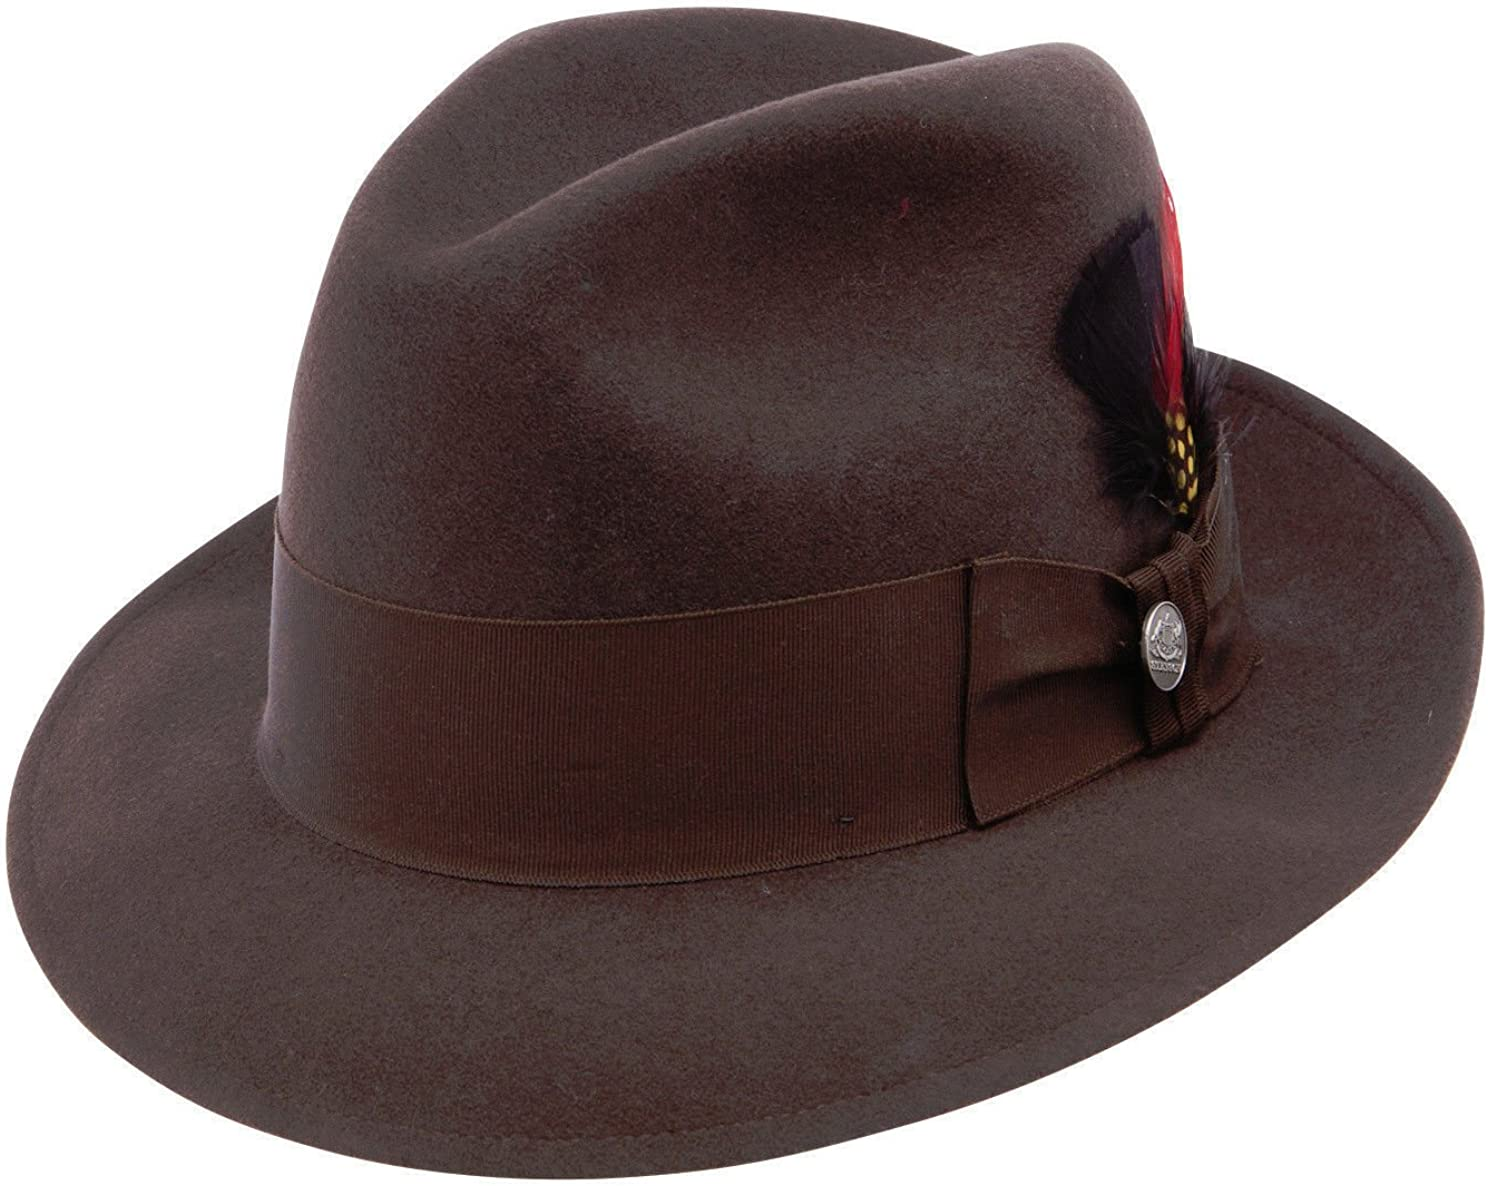 Navy Stetson /& Dobbs TWFRDK-8220 Men/'s Frederick Wool Felt Fedora Hat 7 3//8